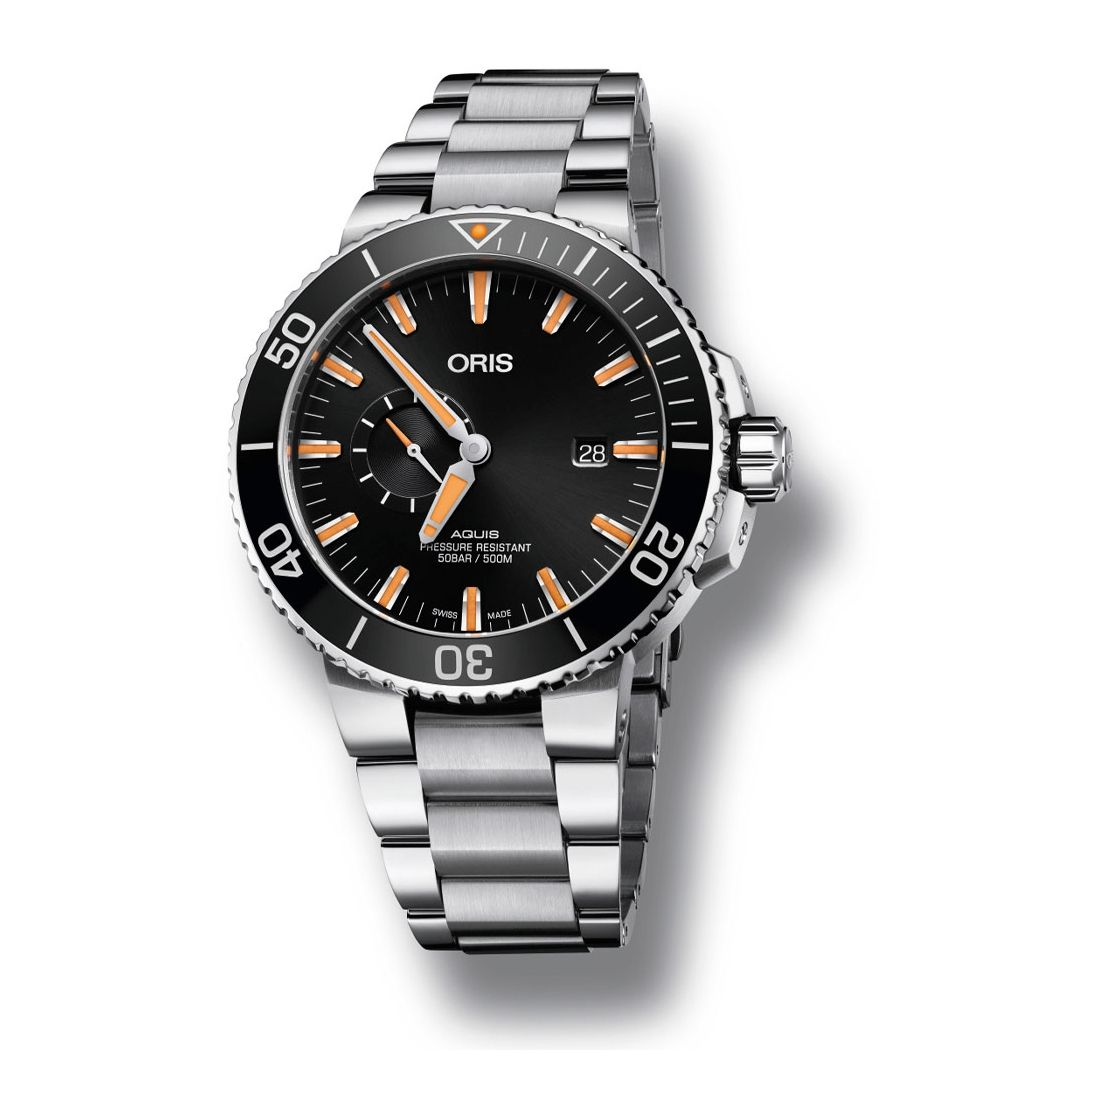 Reloj Oris Aquis Small Second 01 743 7733 4159-07 8 24 05PEB  - 1